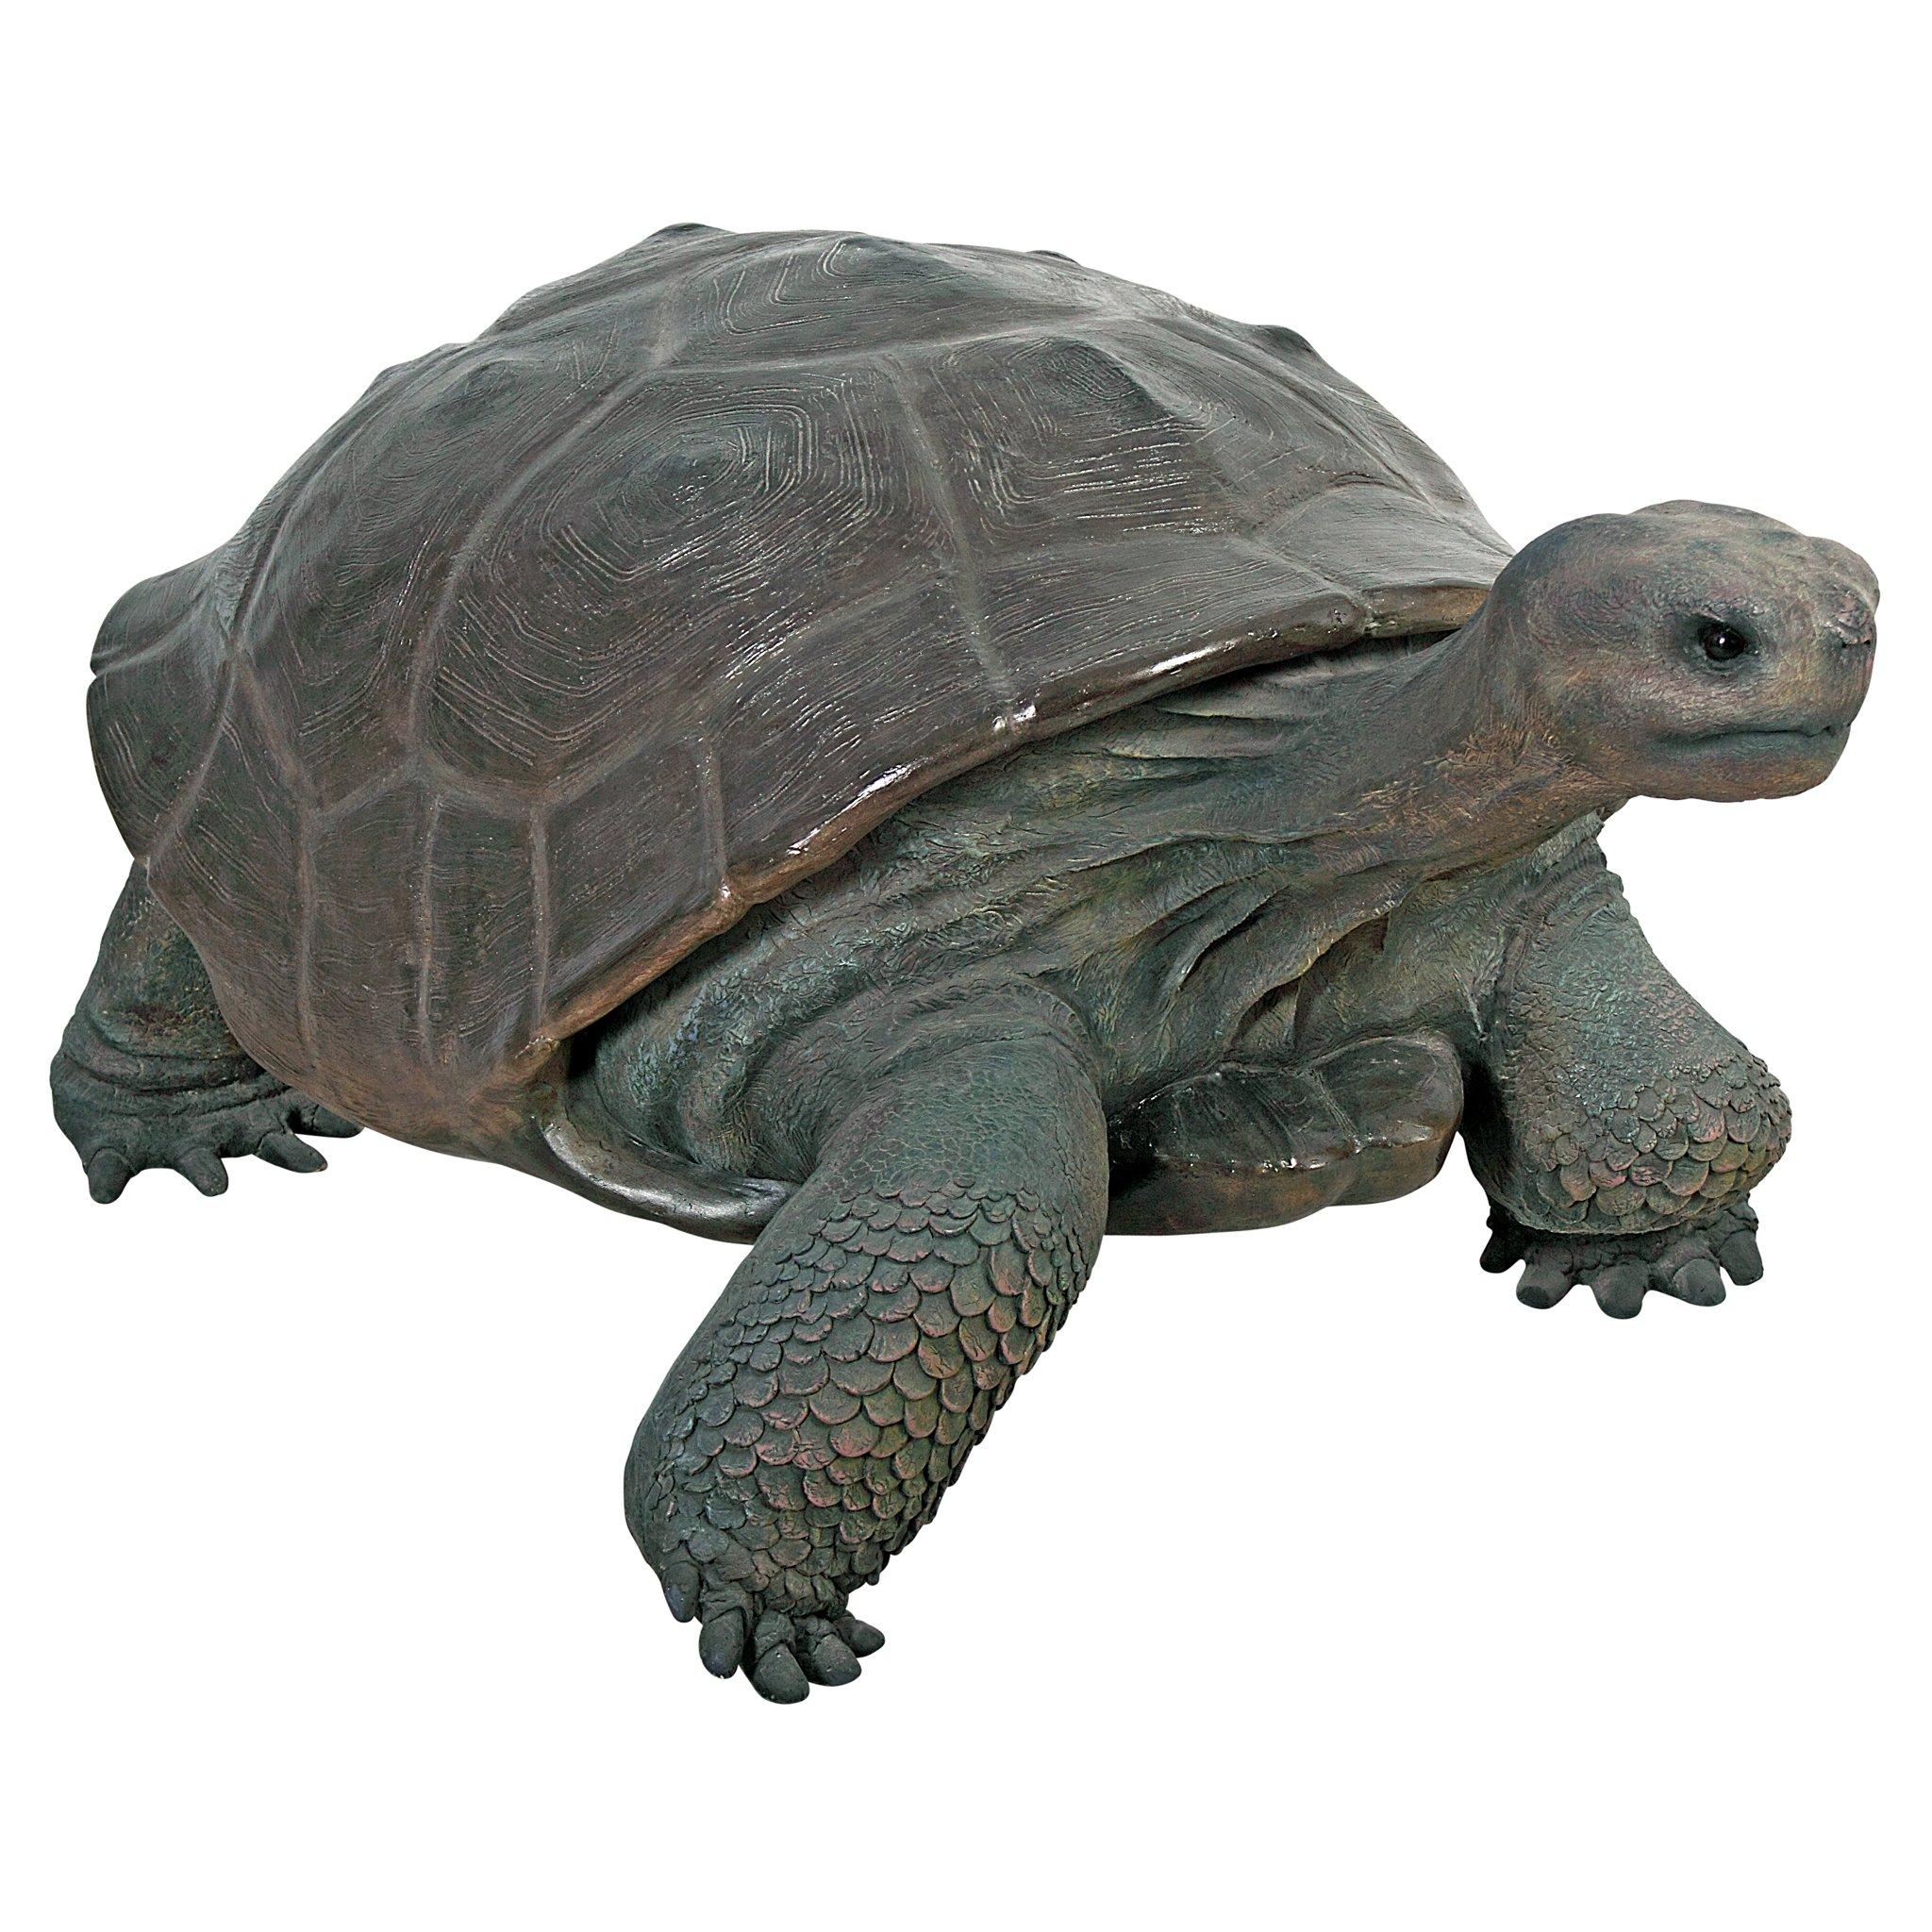 Design Toscano The Grand Scale Wildlife Animal Galapagos Tortoise Statue